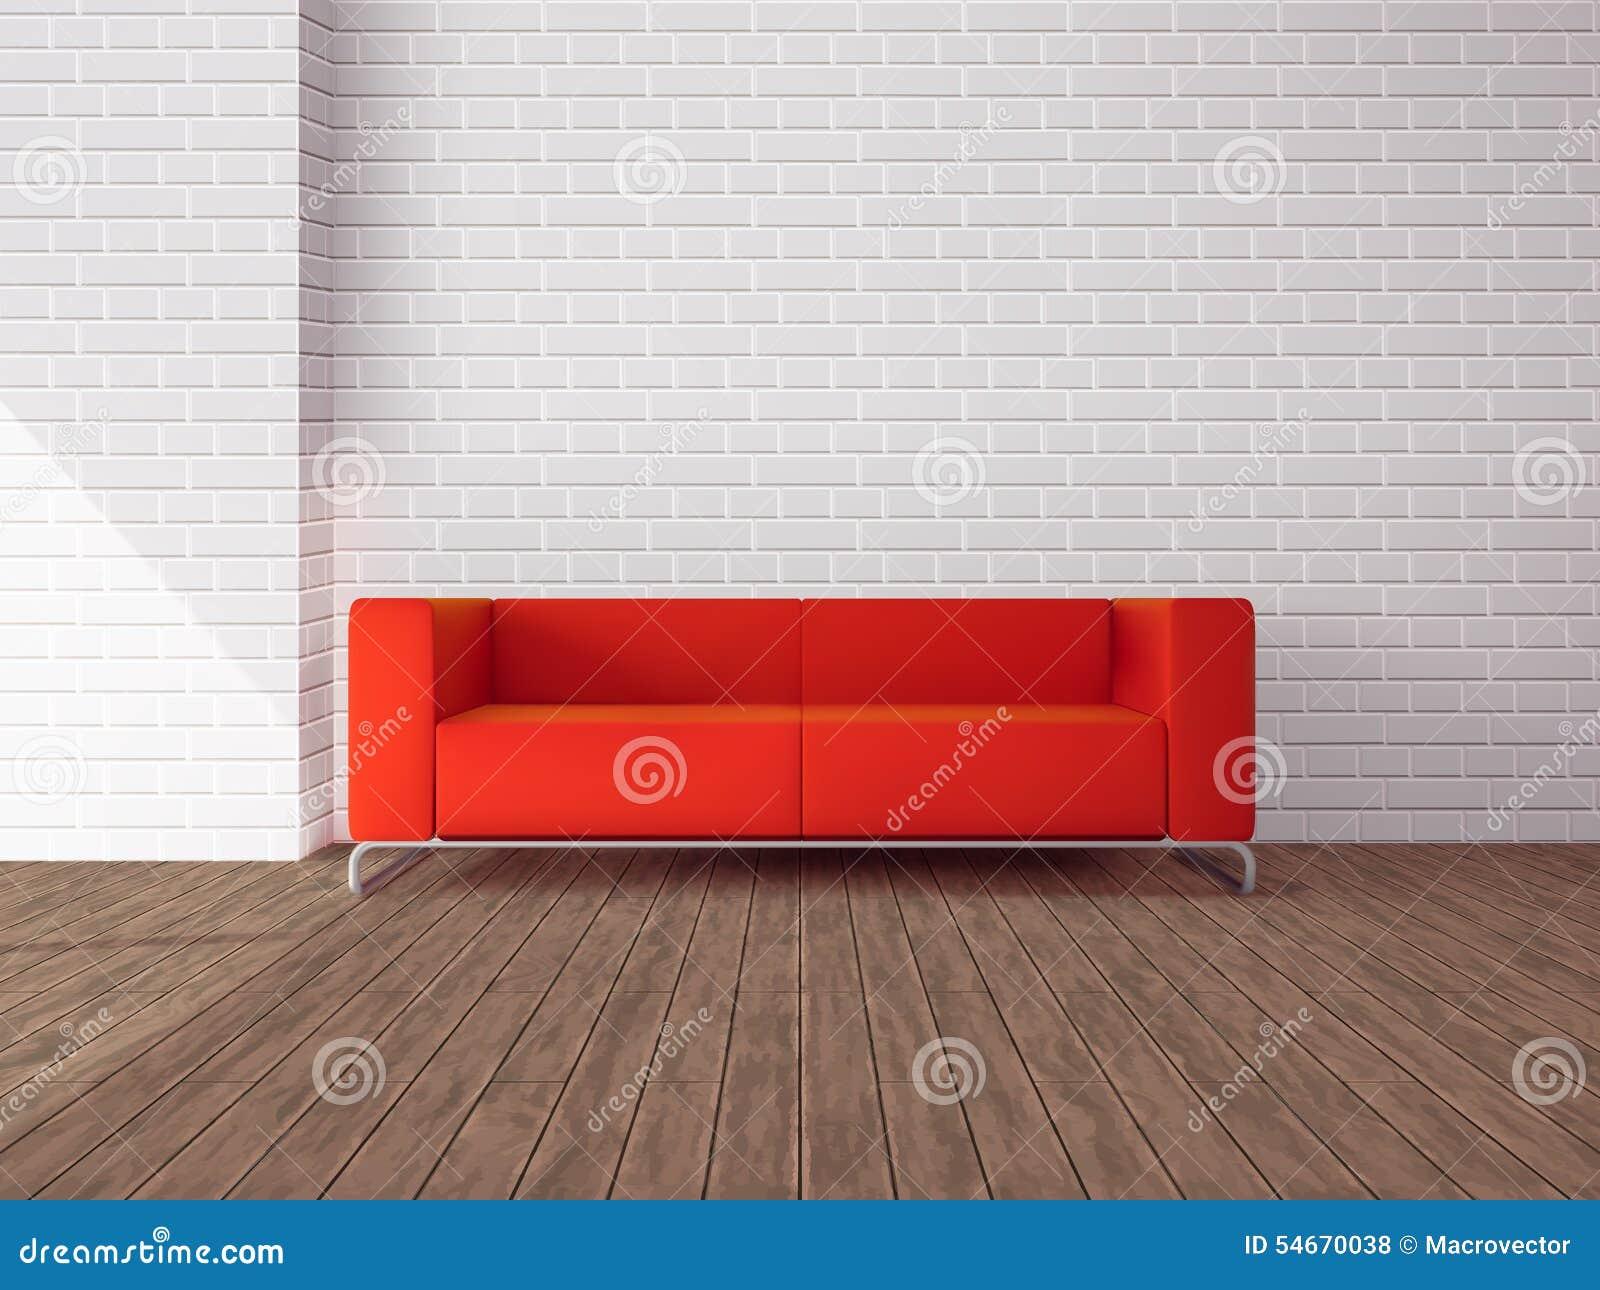 Rotes sofa im raum vektor abbildung image 54670038 for Sofa im raum